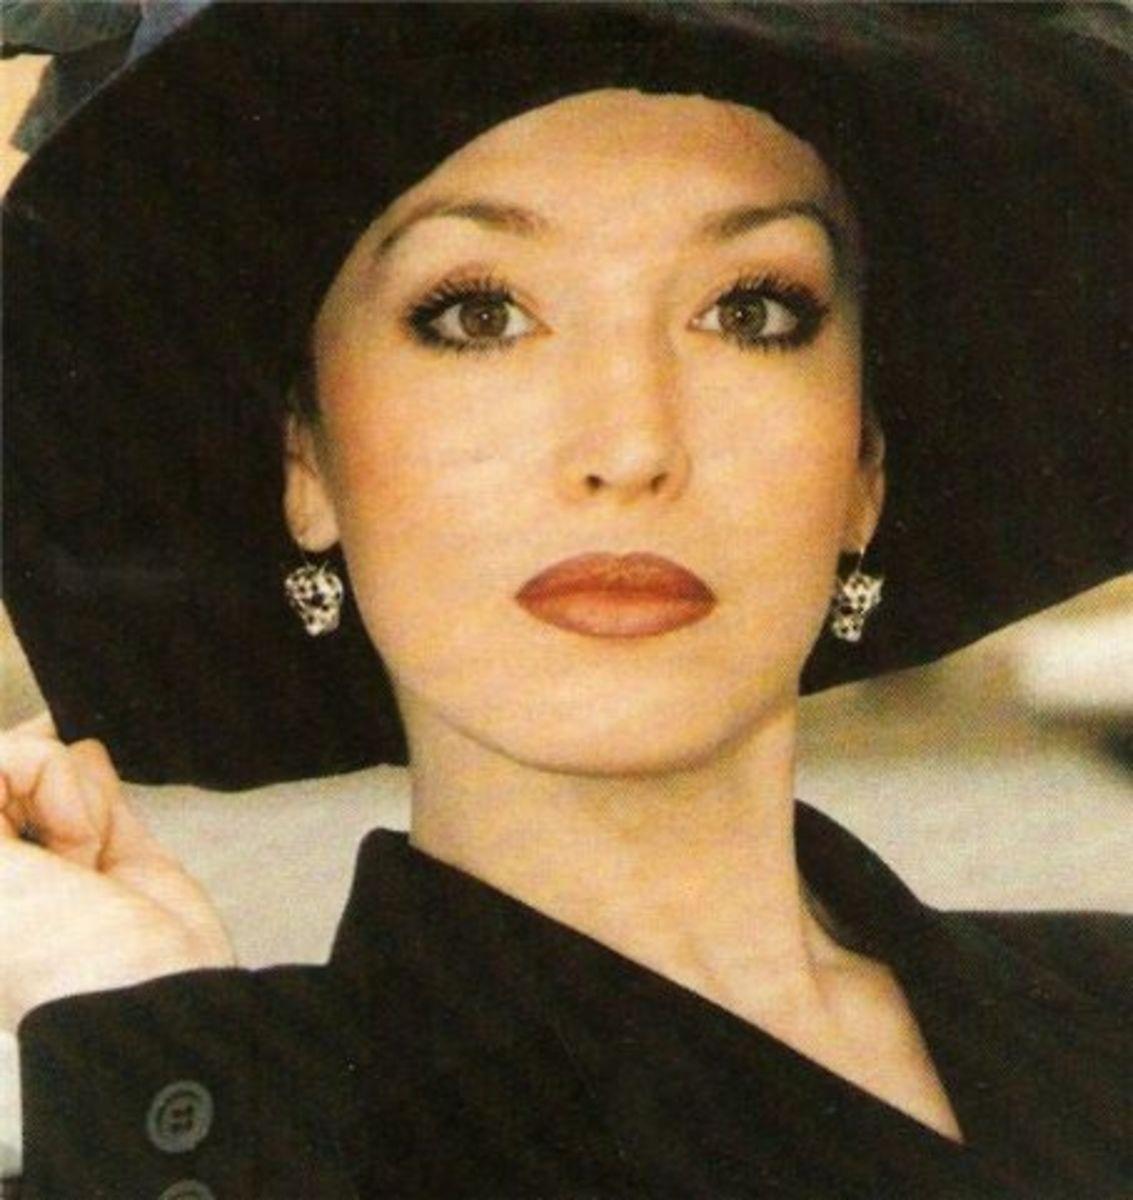 Anna Vladlenovna Samokhina (January 14, 1963  February 8, 2010) - cancer deaths